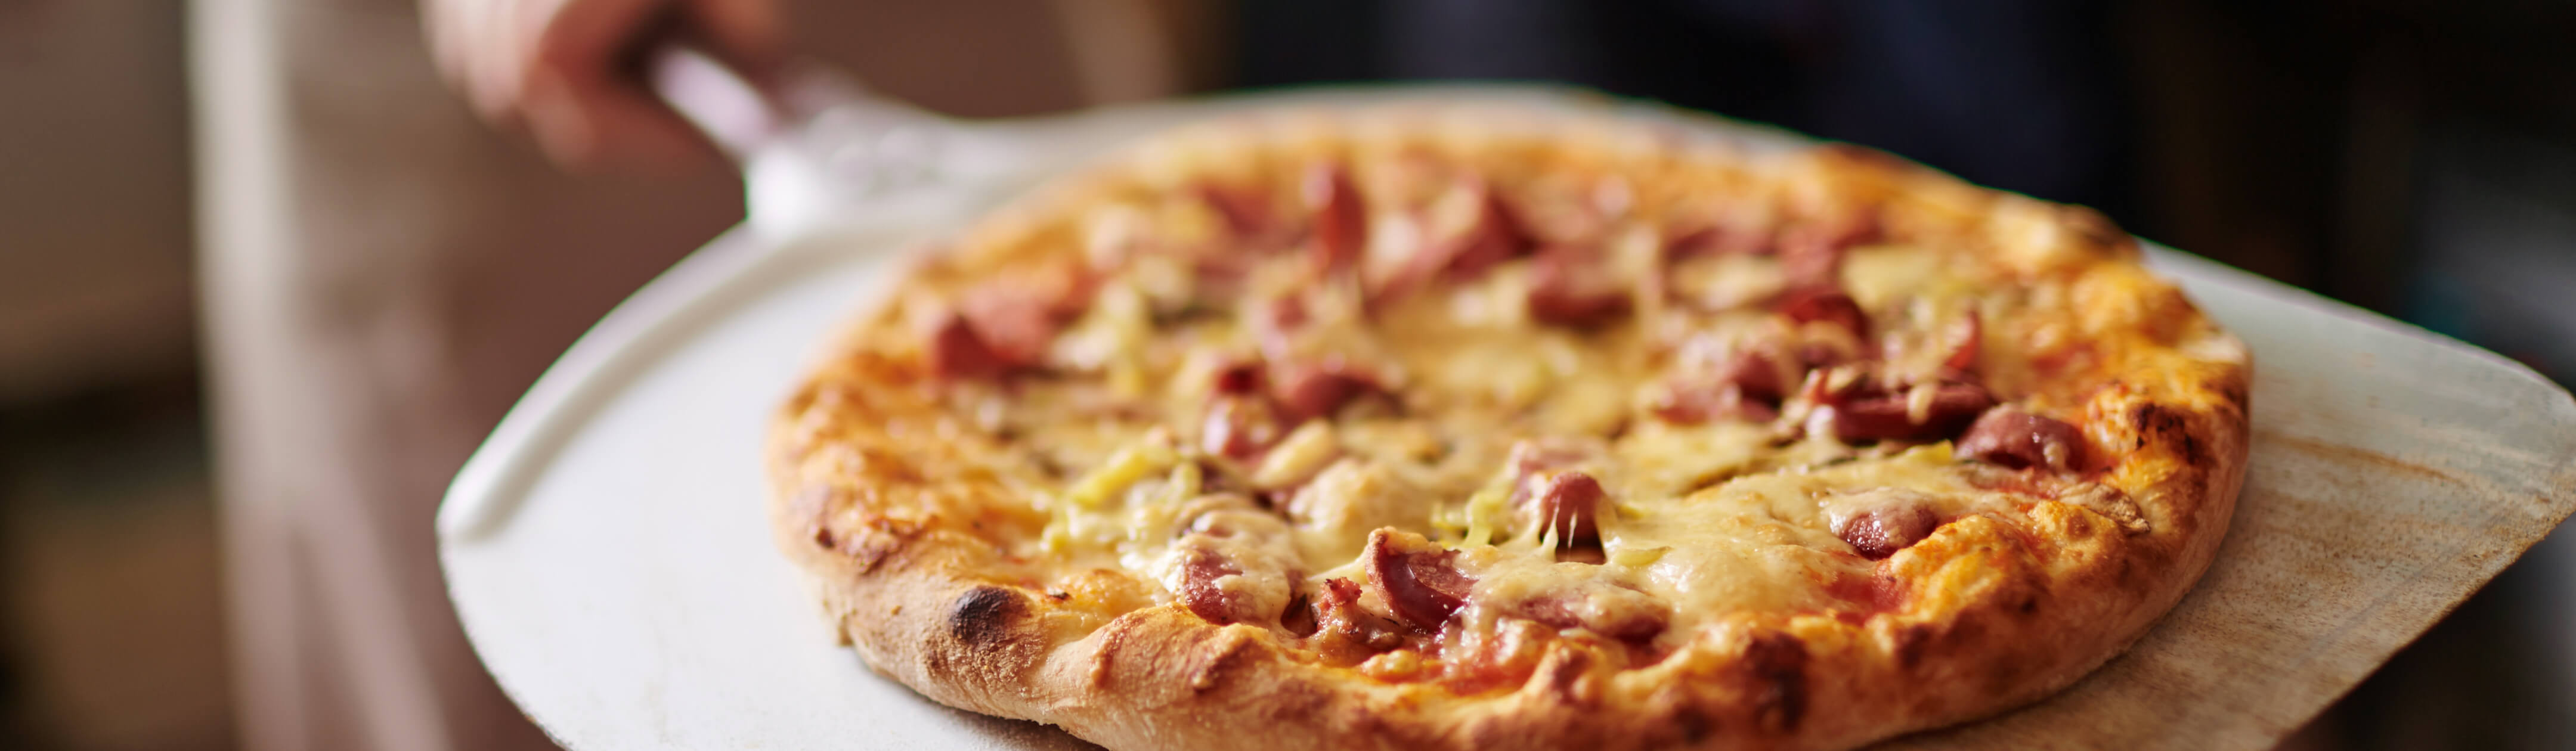 Ameci Pizza & Pasta Los Angeles CA